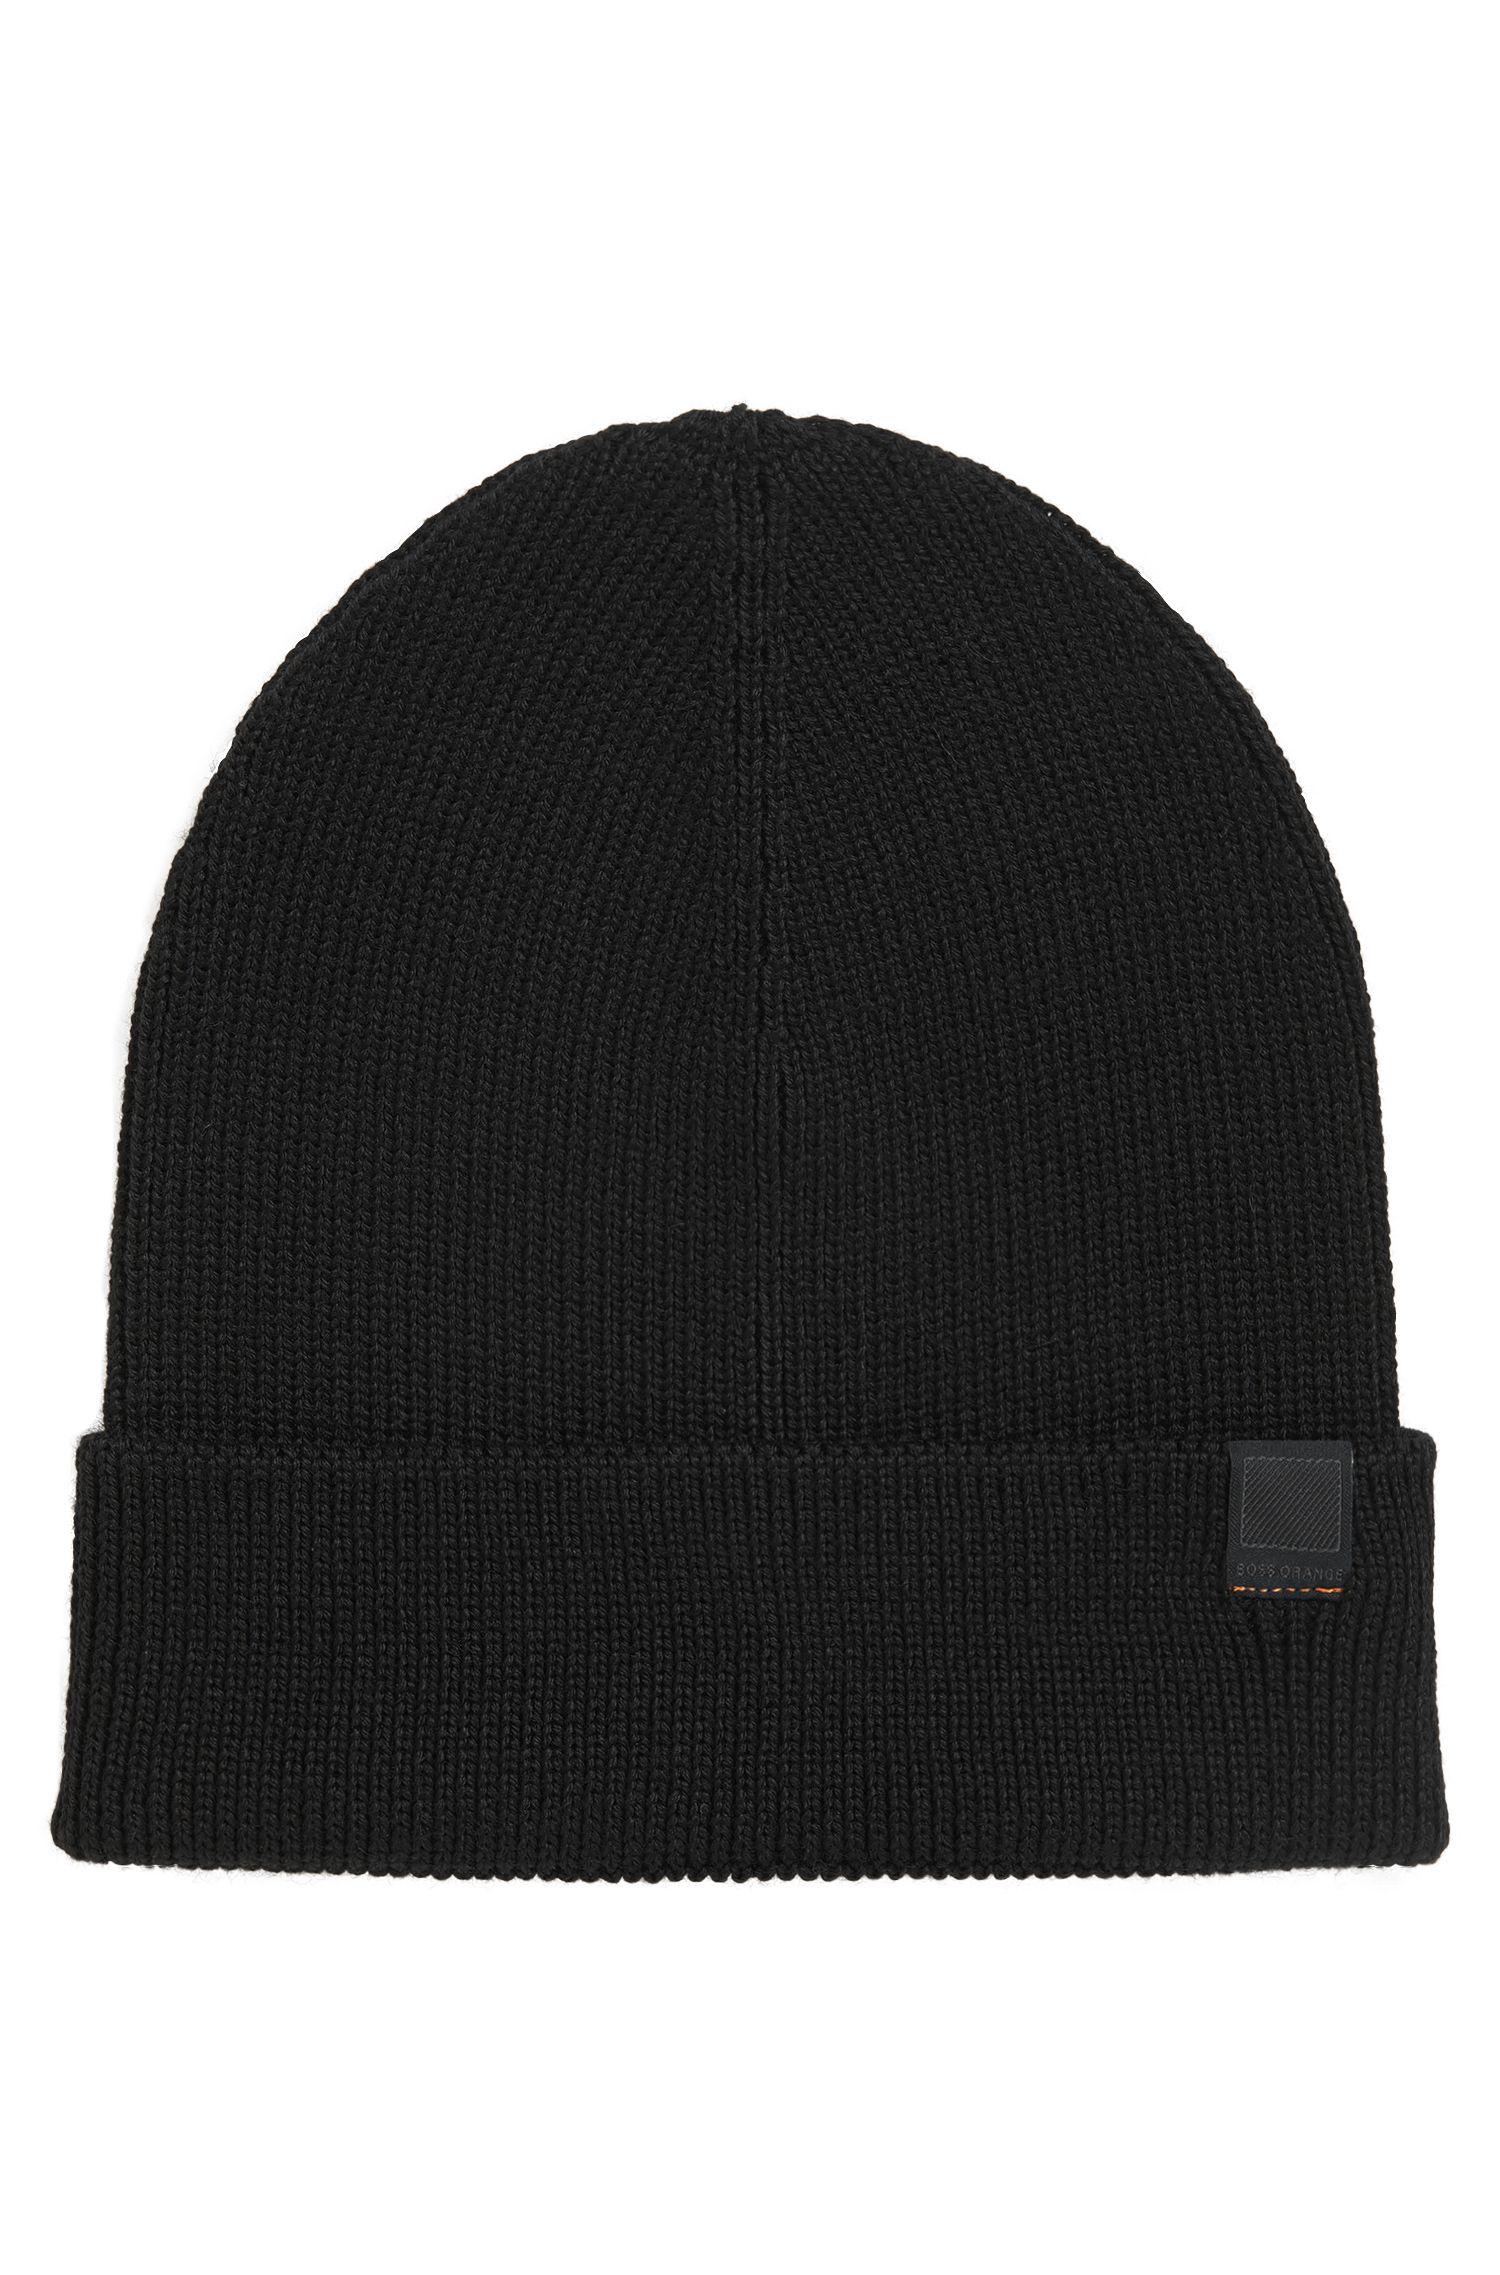 Snug knitted beanie hat in wool blend